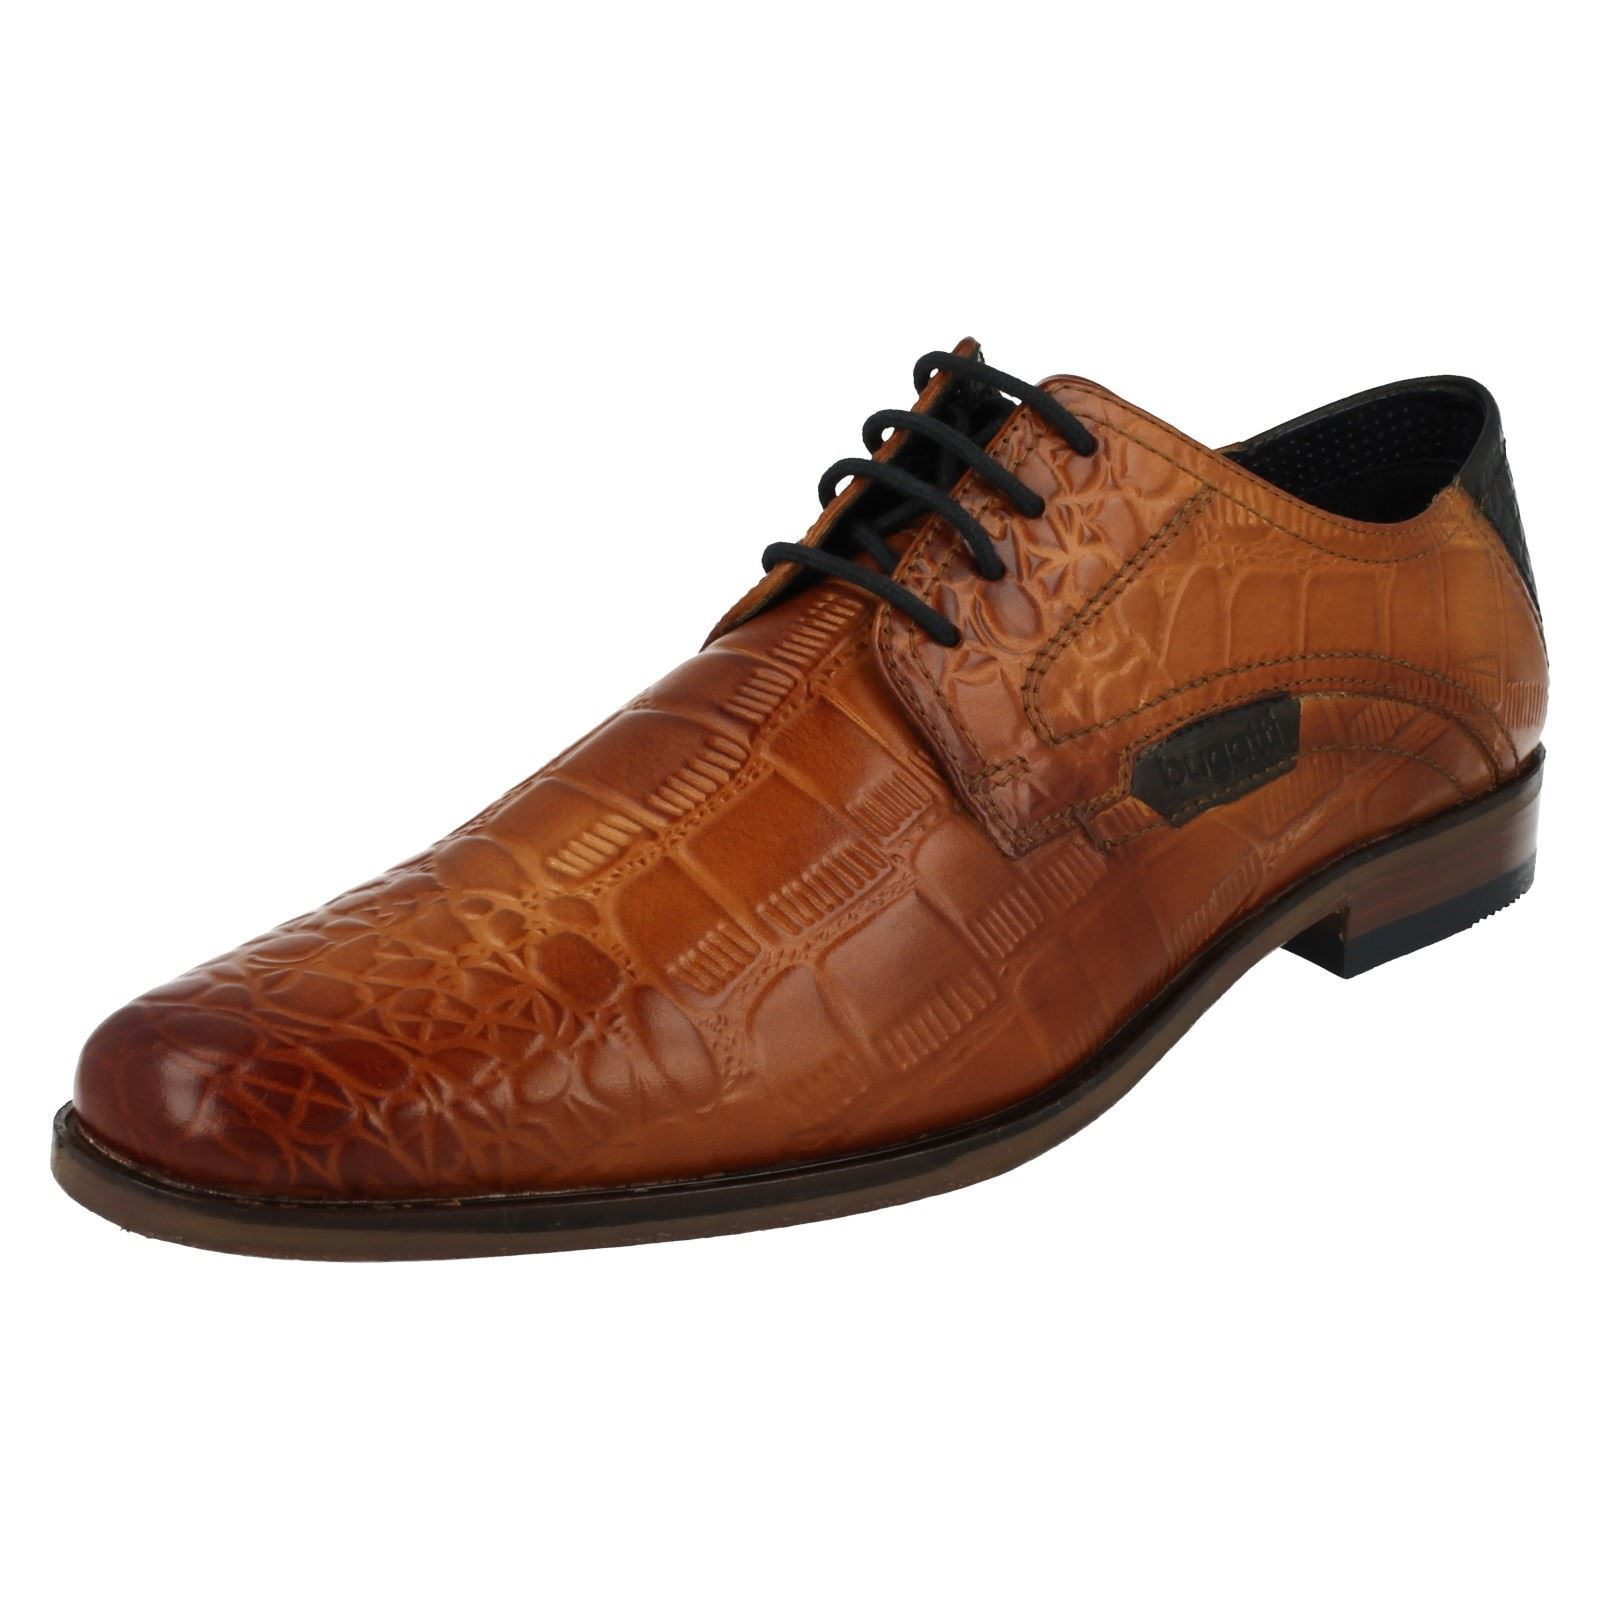 CABALLEROS Bugatti Inteligente Zapatos Con Cordones 15601